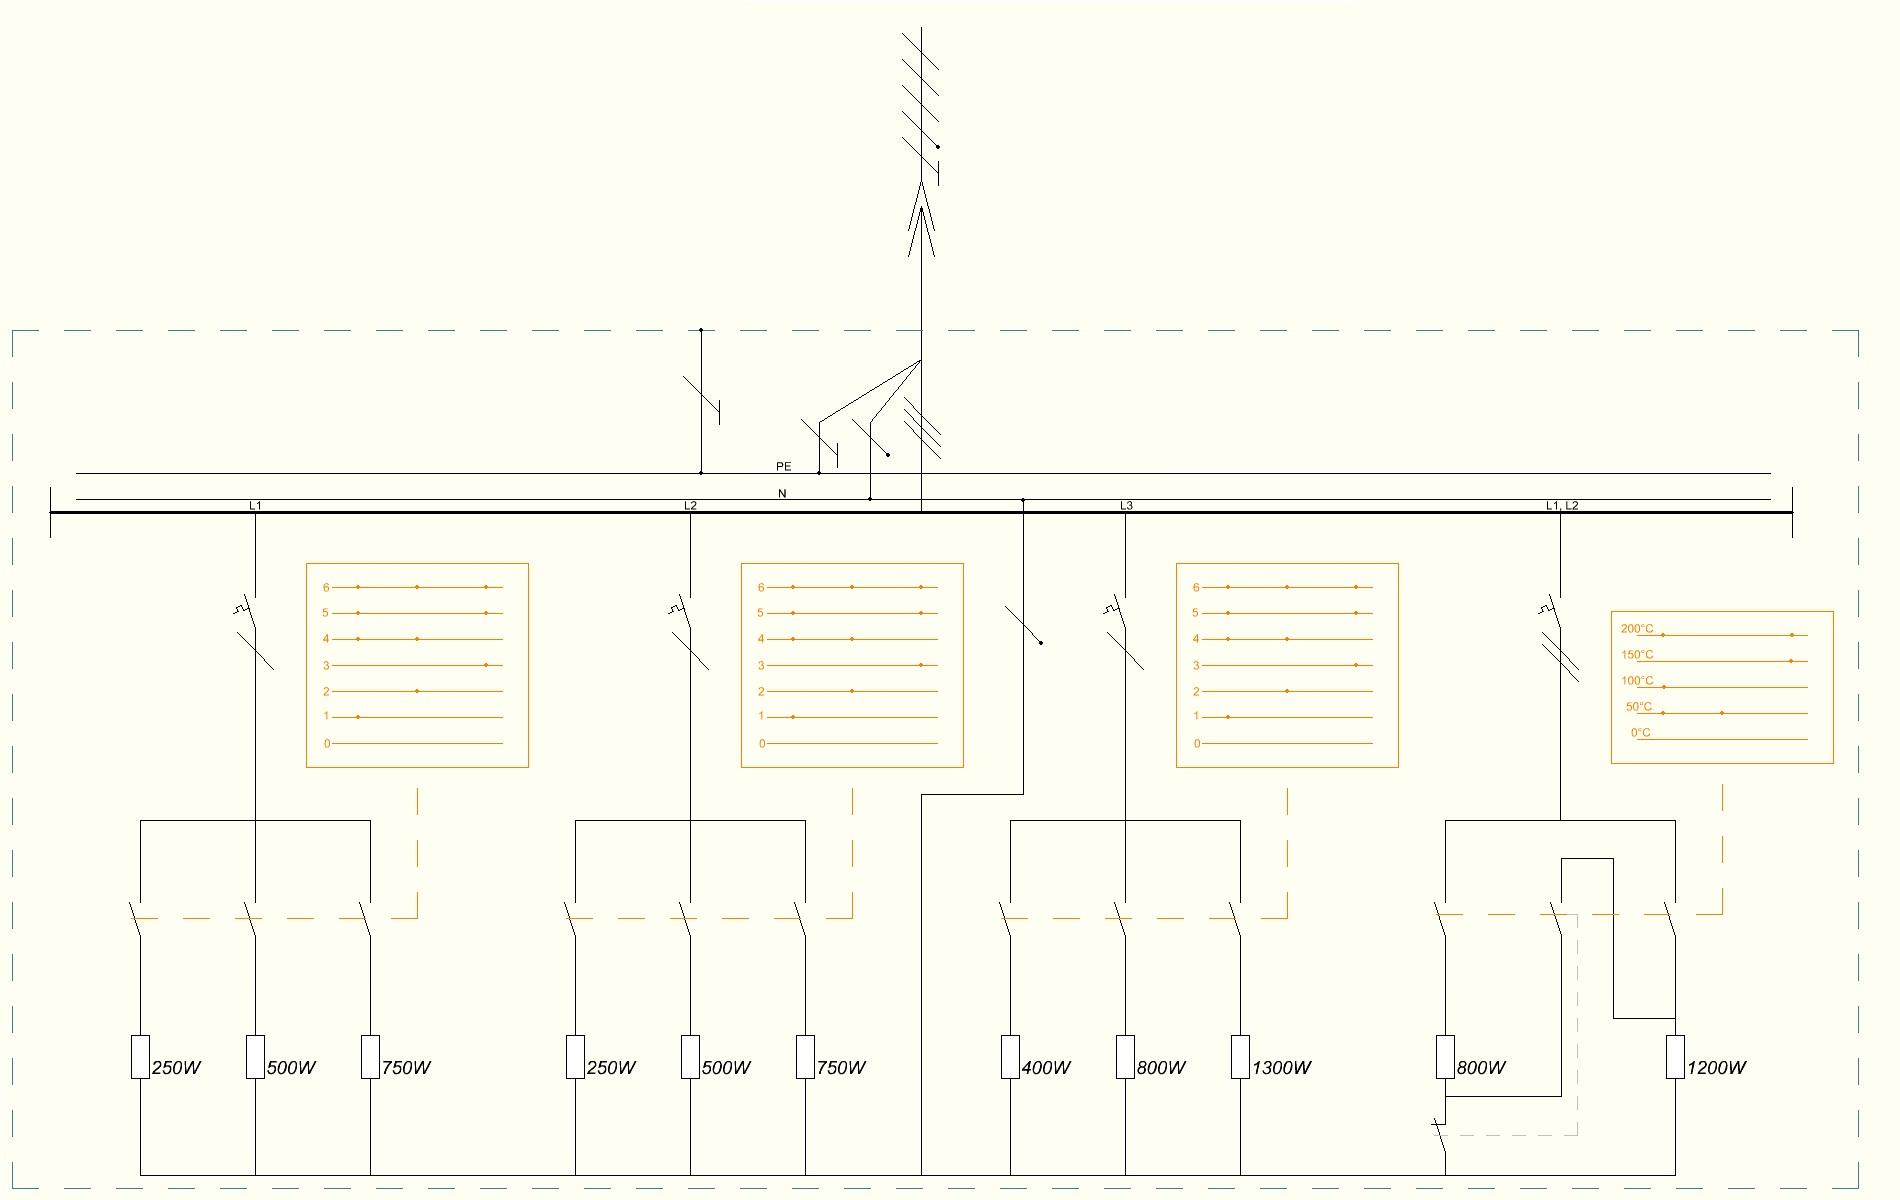 Fabulous File Schematic Wiring Diagram Of Electrical Stove Jpg Wikimedia Wiring Cloud Rineaidewilluminateatxorg